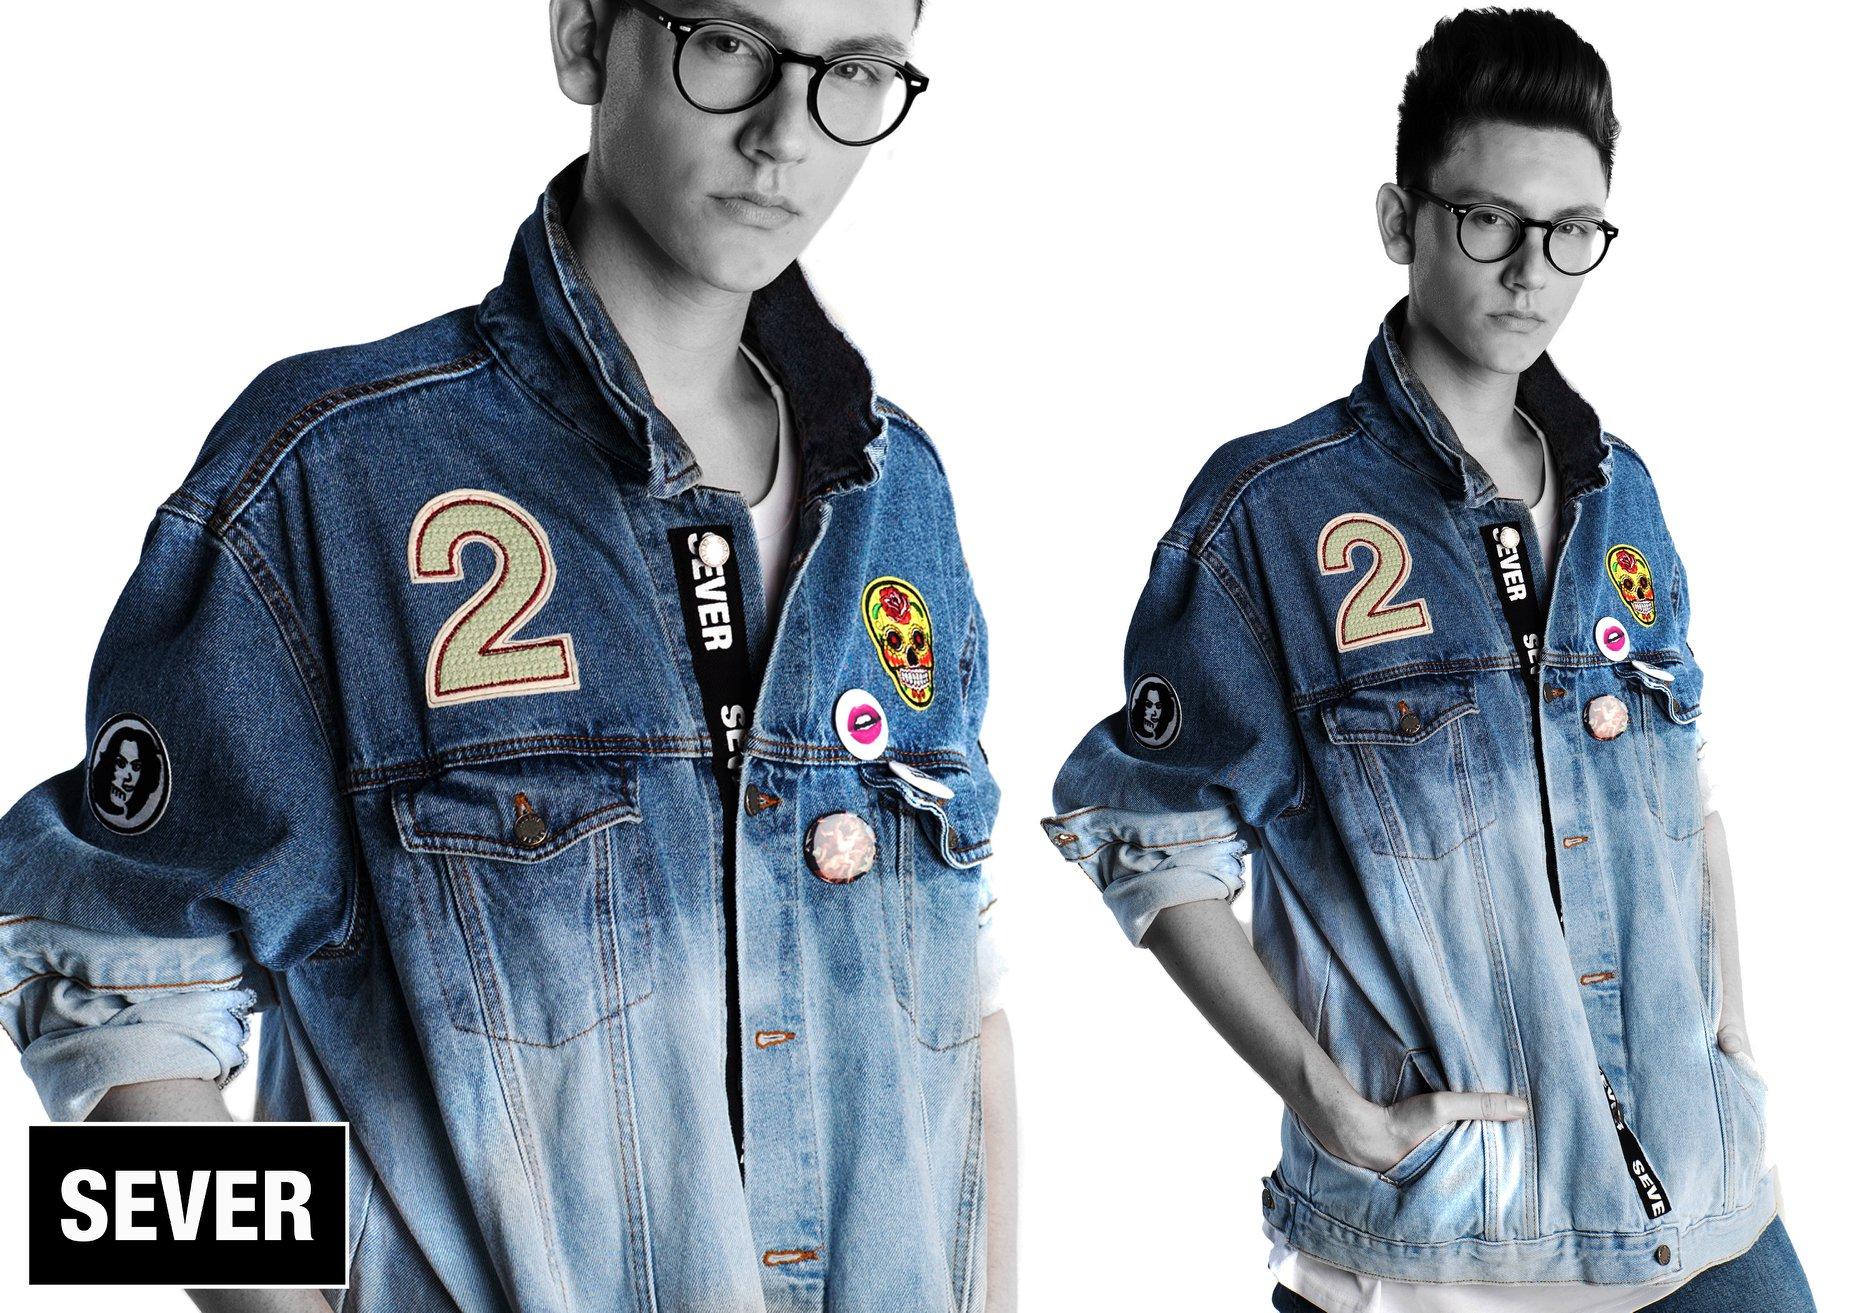 robert-sever-4-streetwear-kolekcija-luka-lajić